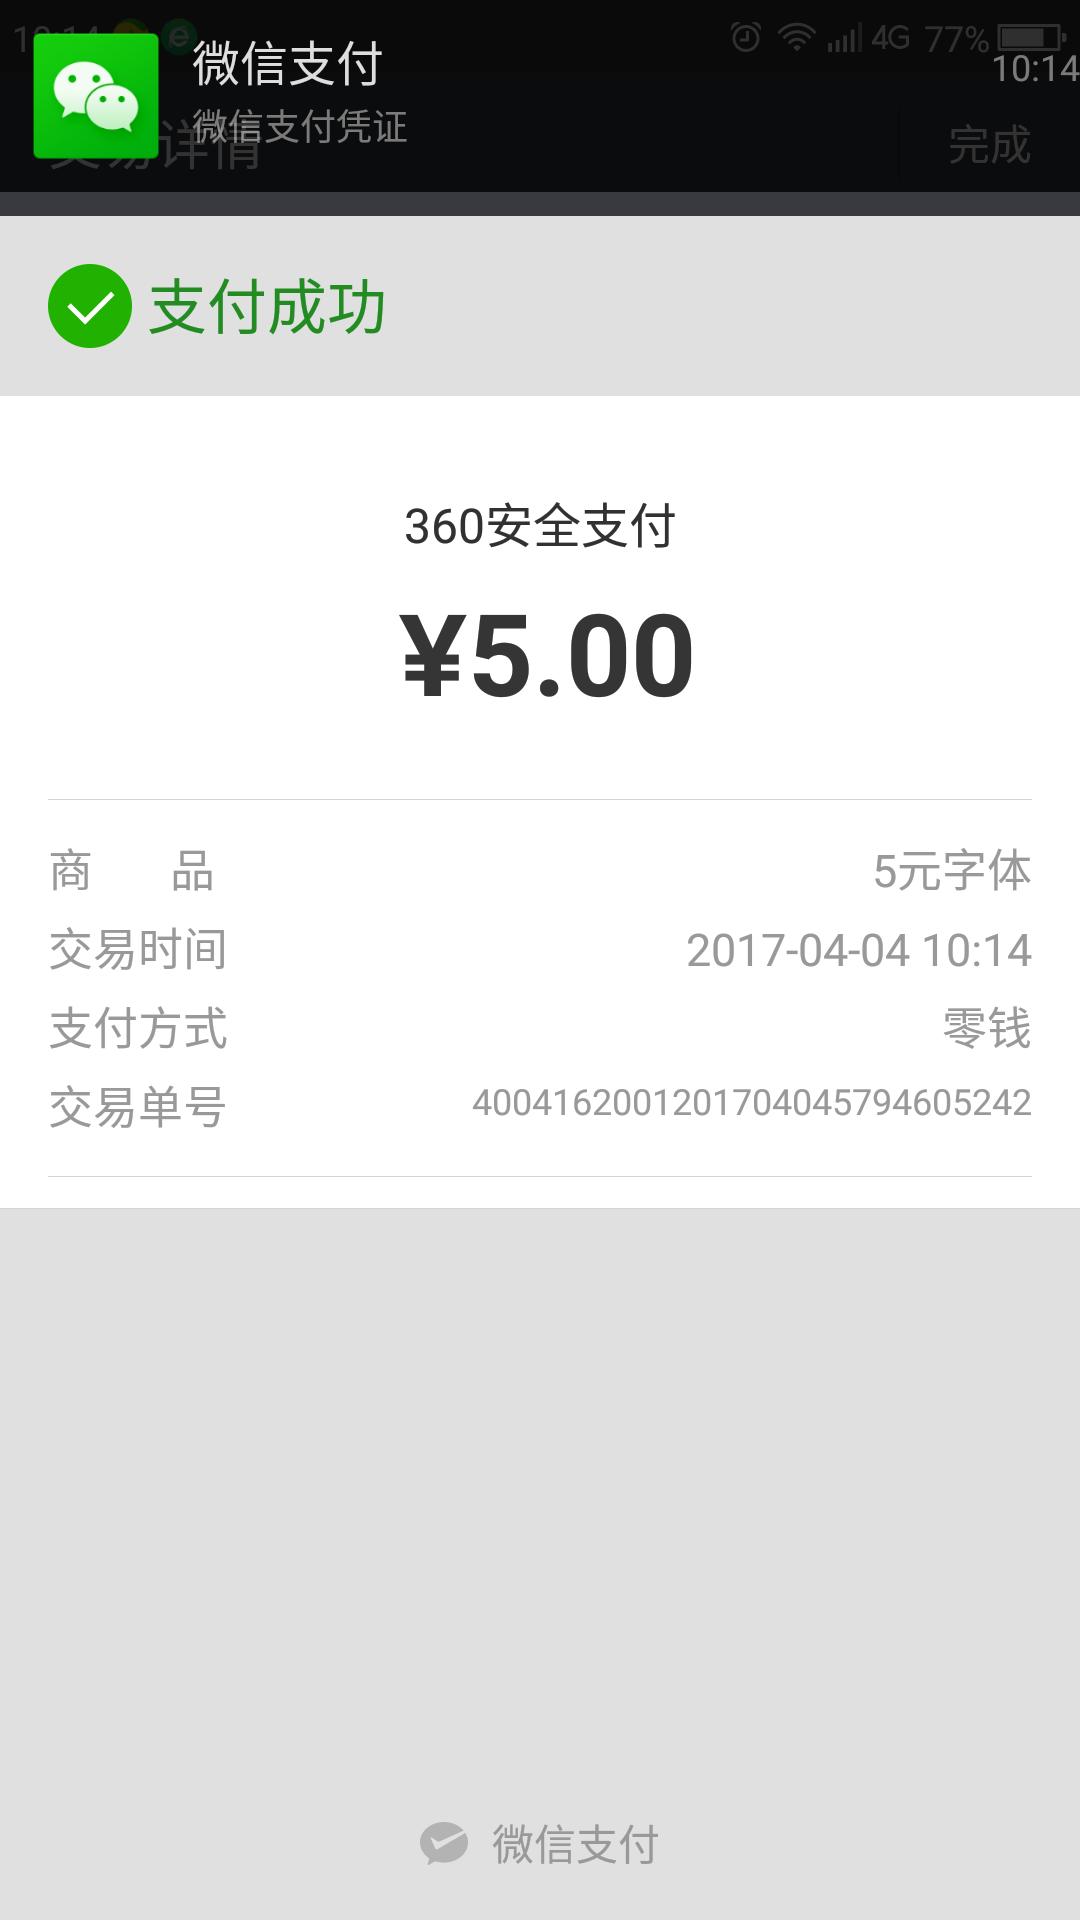 Screenshot_2017-04-04-10-14-12.png